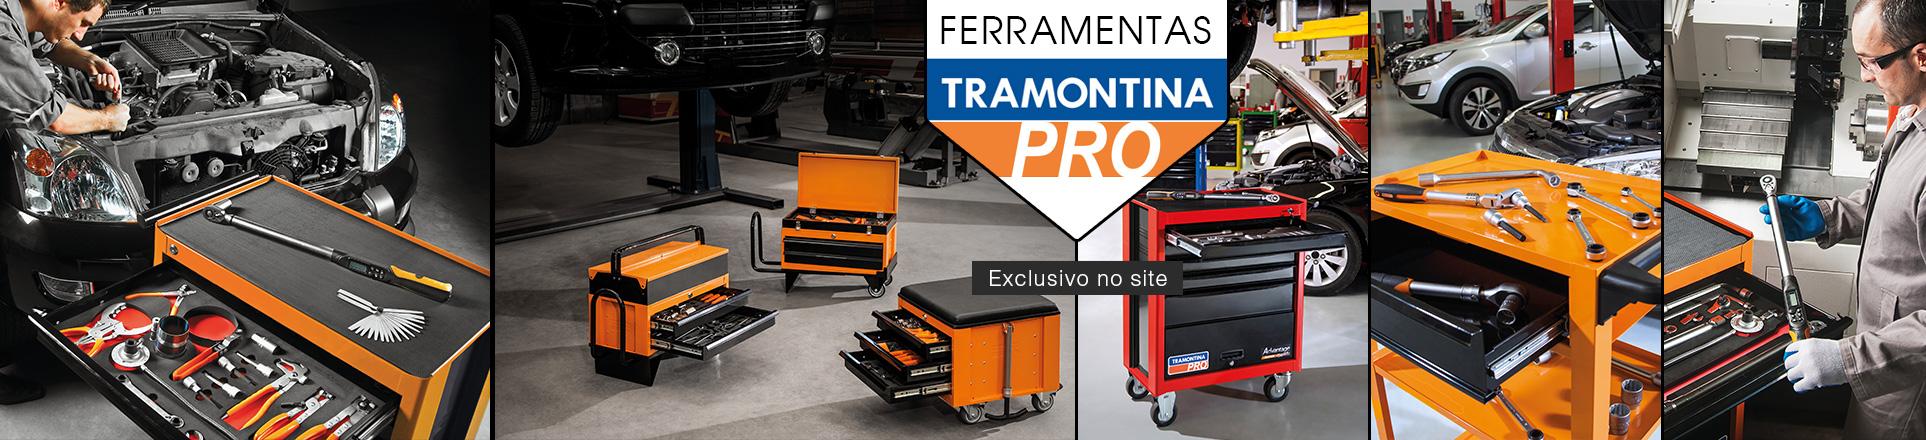 Banner - Tramontina